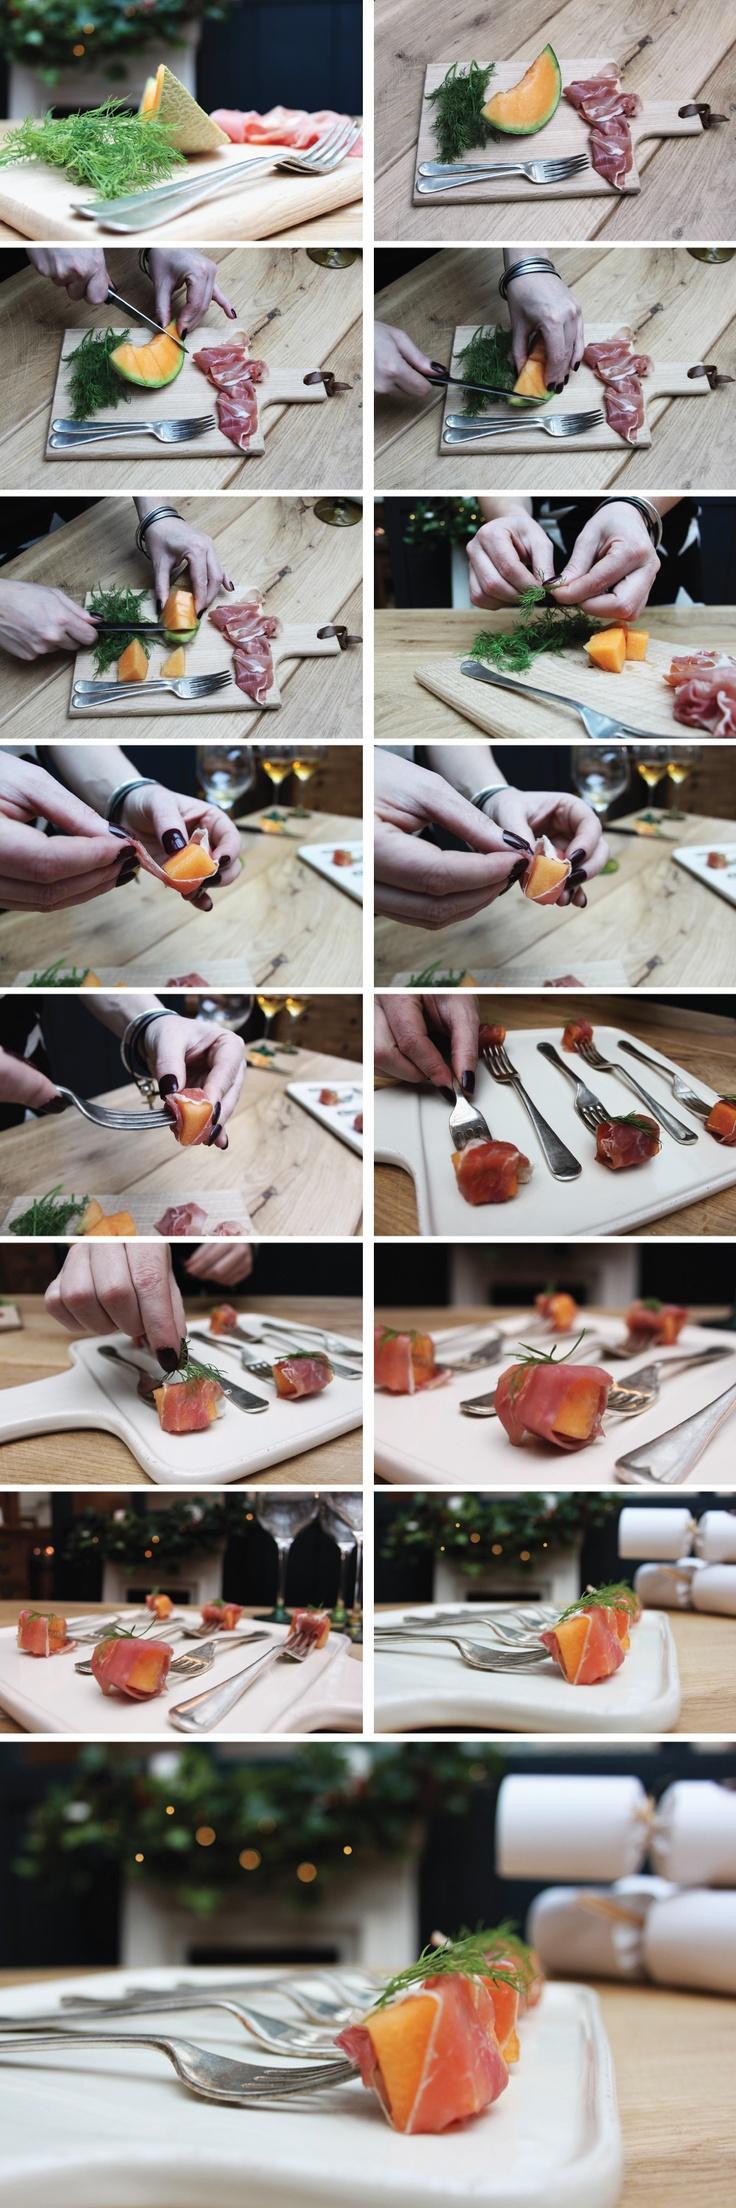 Prosciutto and melon tasting forks tutorial via @Indigo Furniture